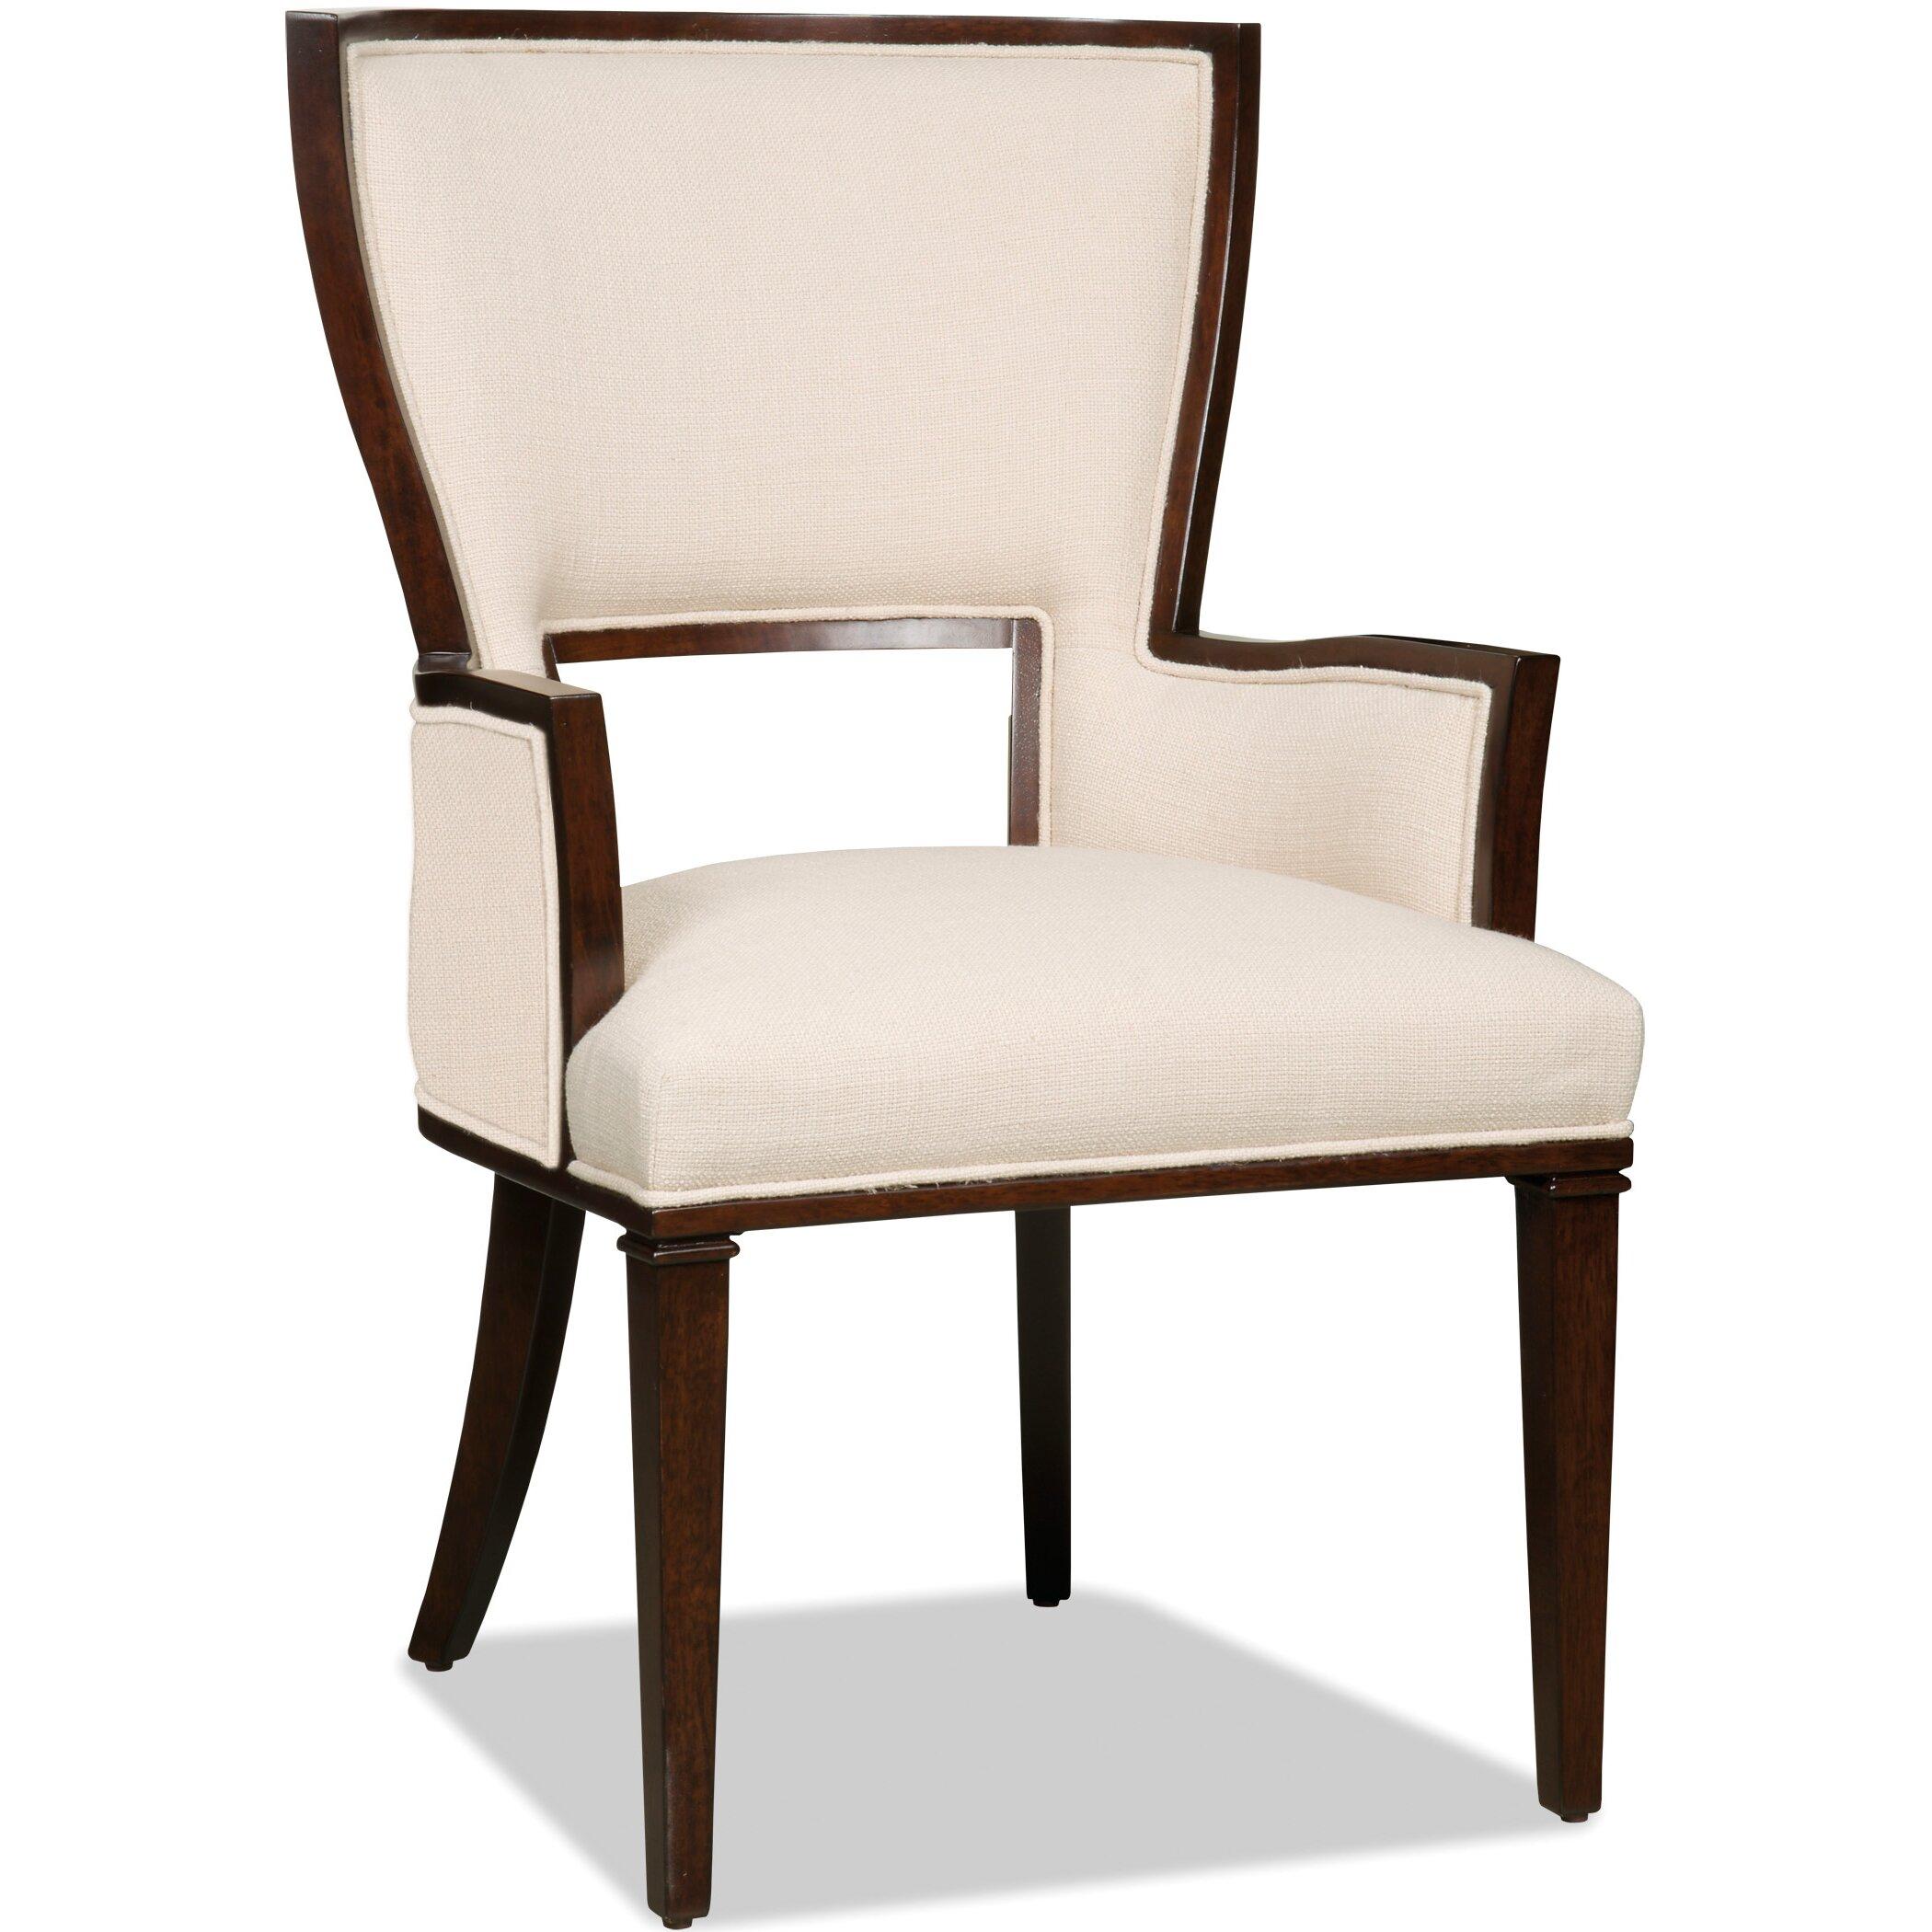 arm chair wayfair. Black Bedroom Furniture Sets. Home Design Ideas